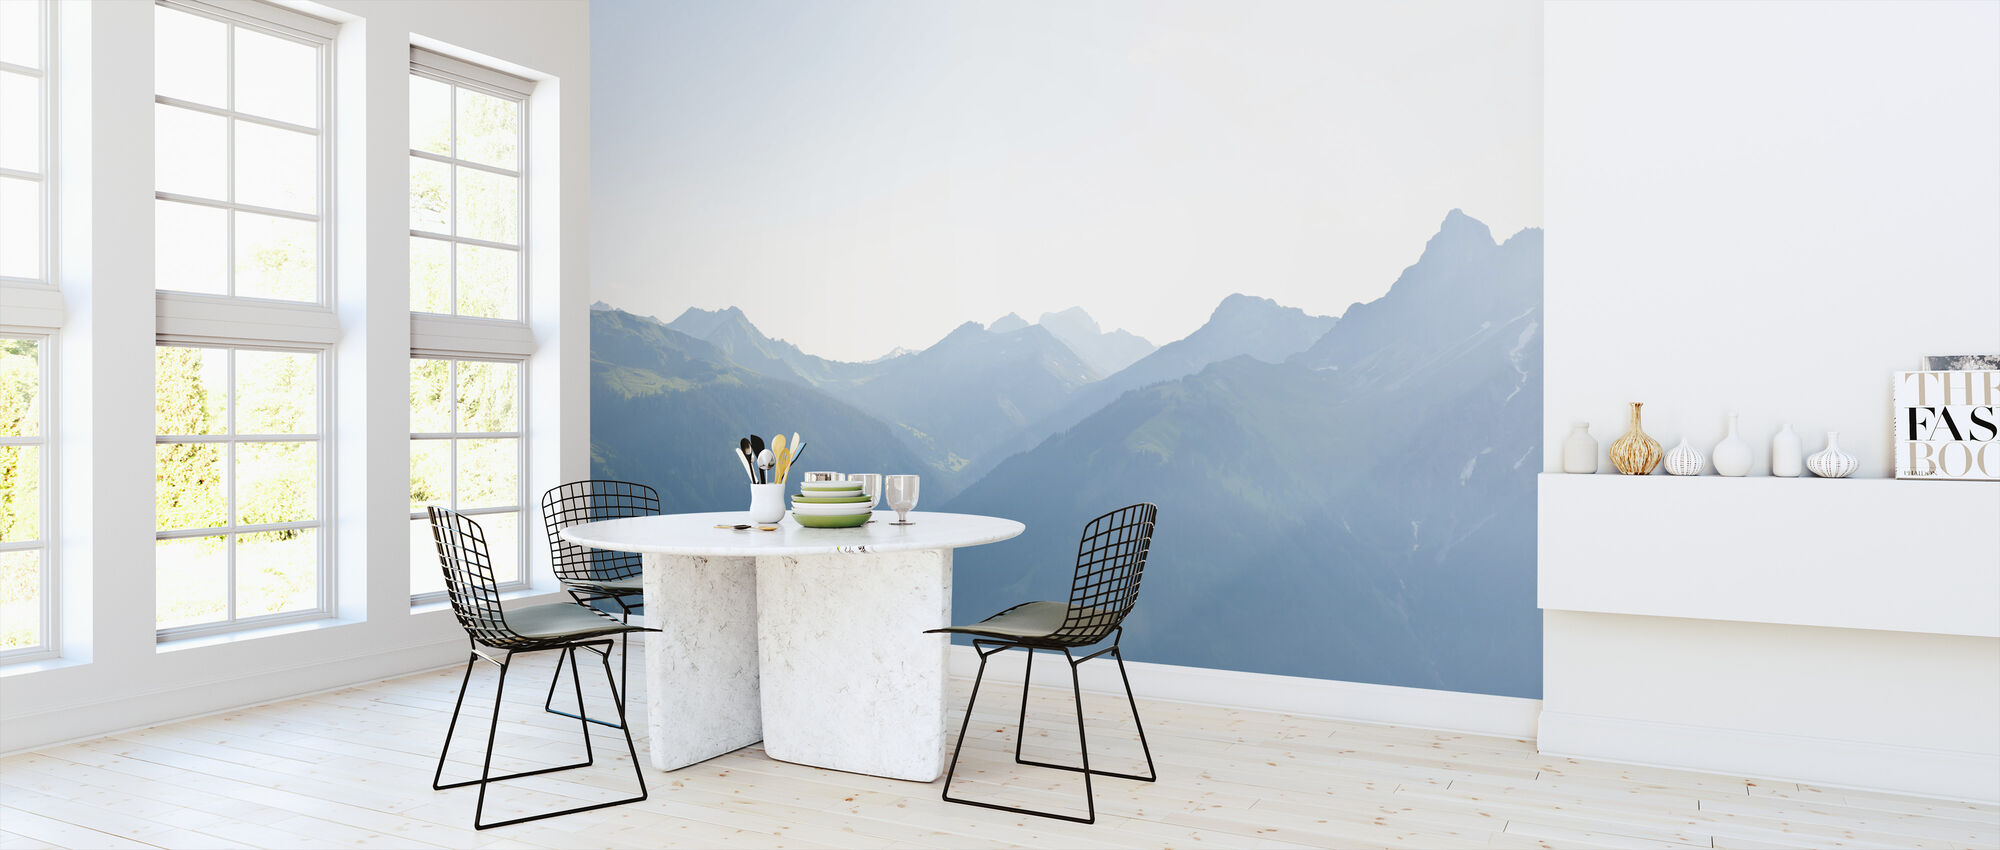 Vorarlberg, Austria - Tapetti - Keittiö